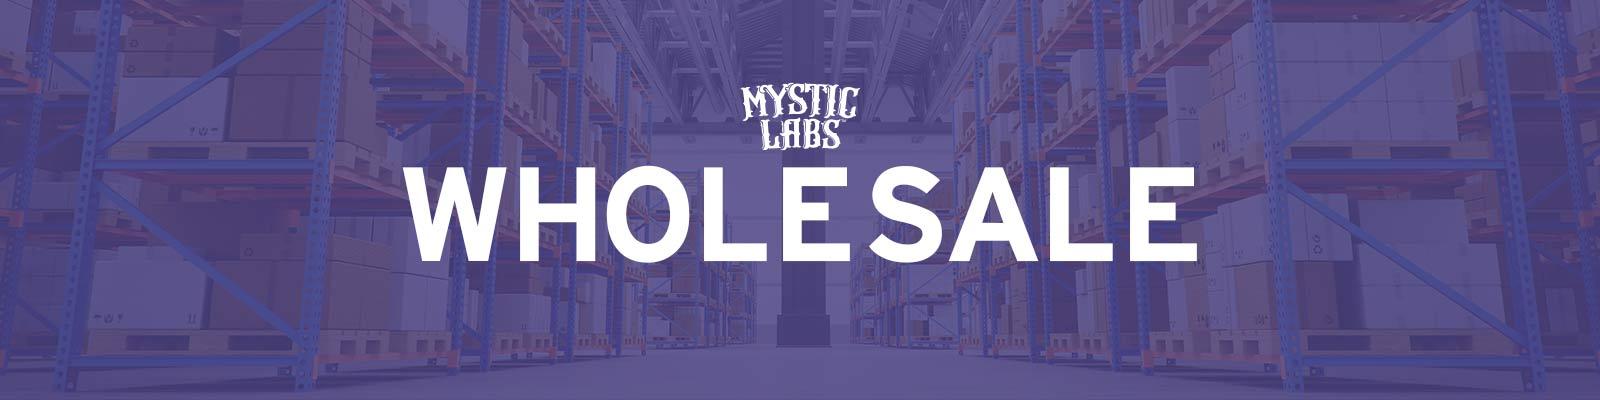 Wholesale Mystic Labs